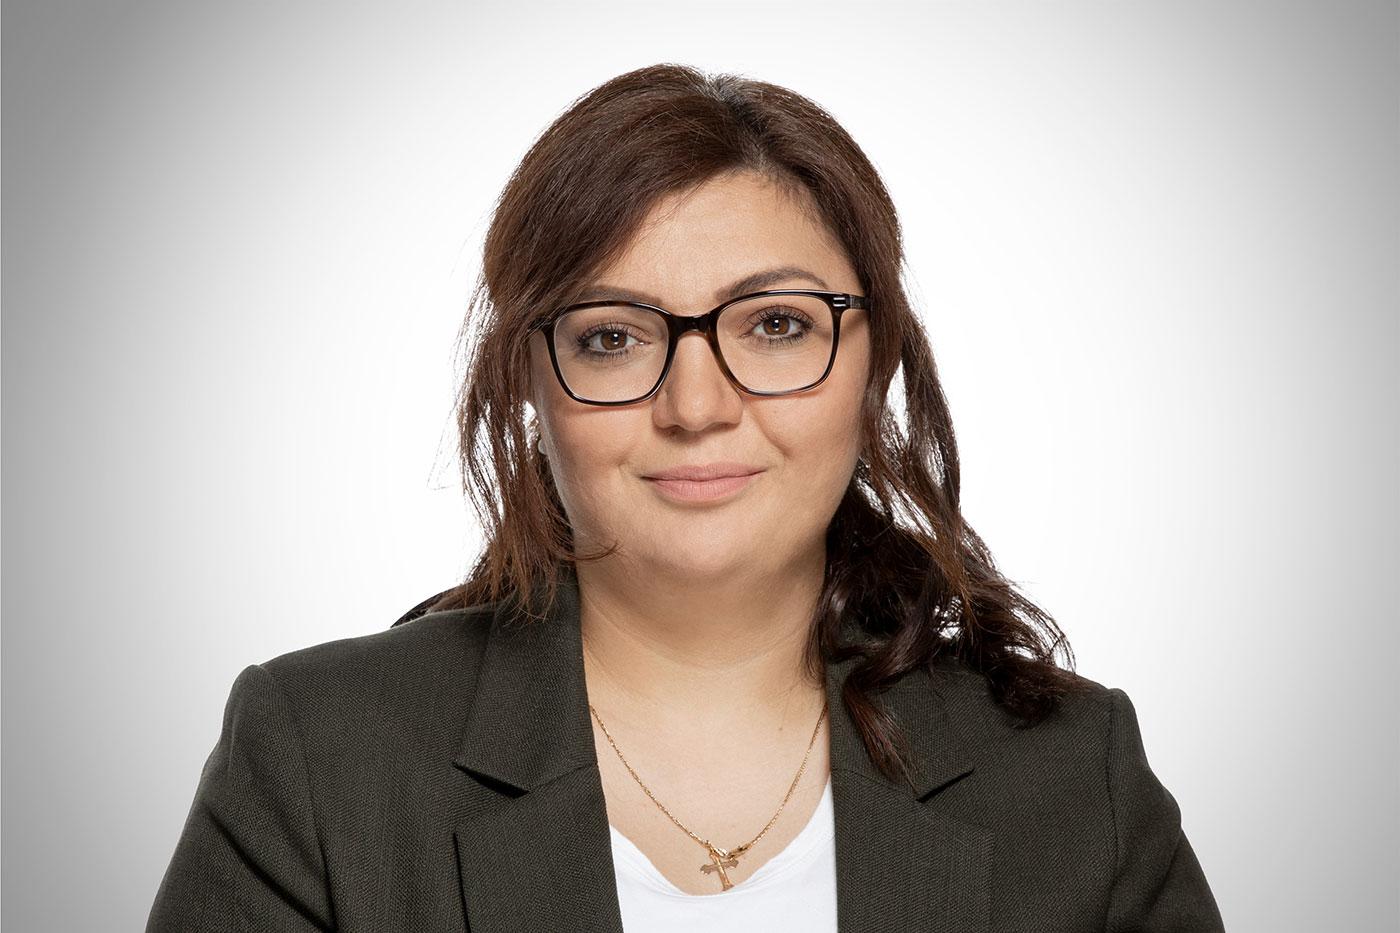 Valentina Symeonidou